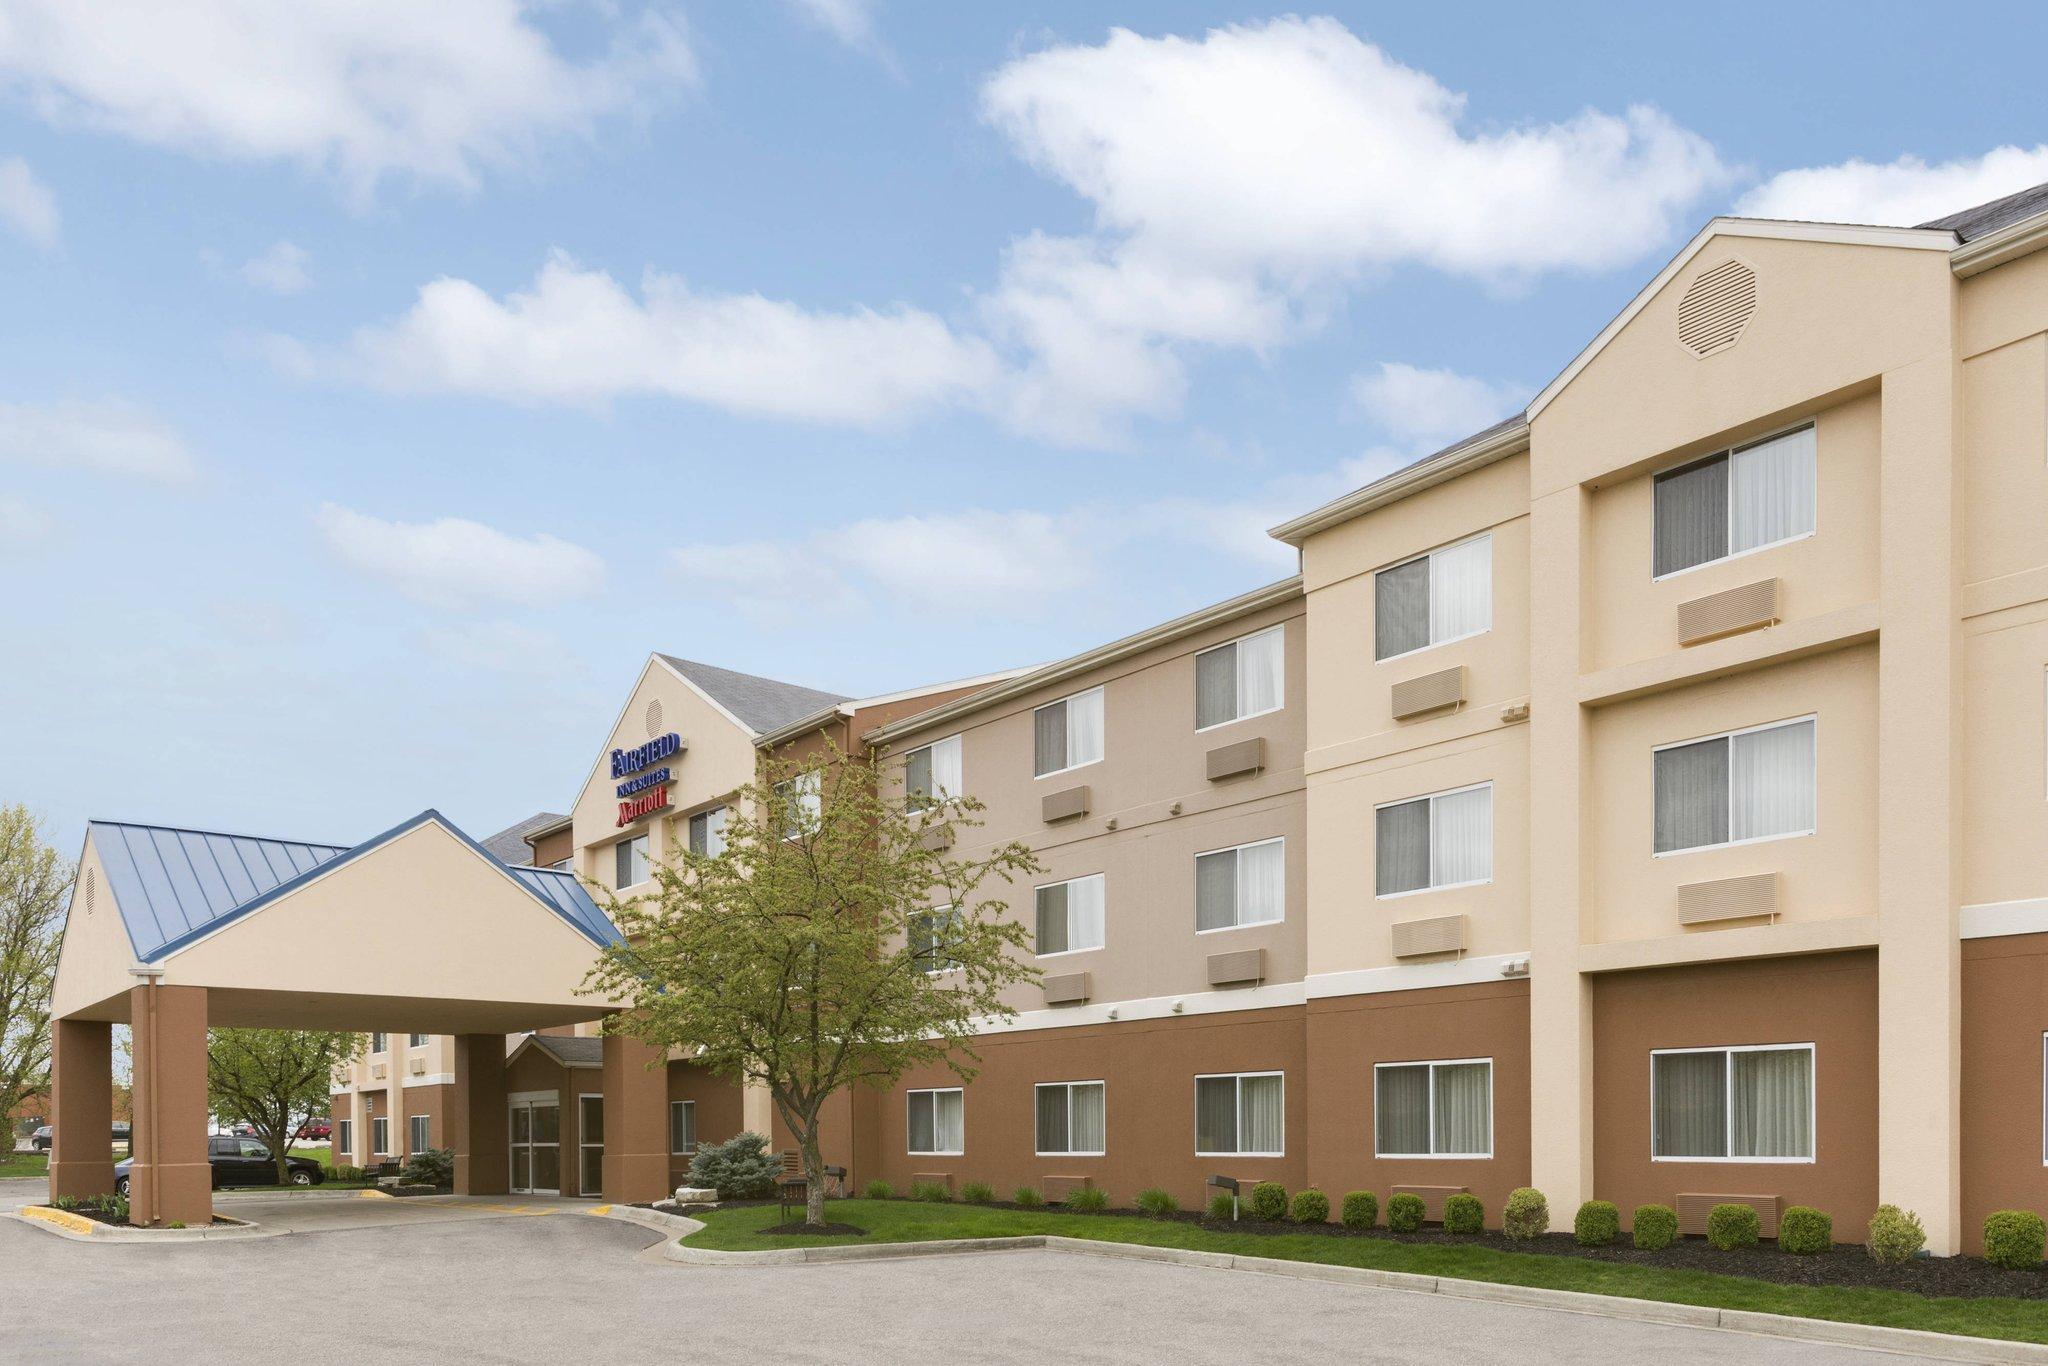 Fairfield Inn And Suites Grand Rapids